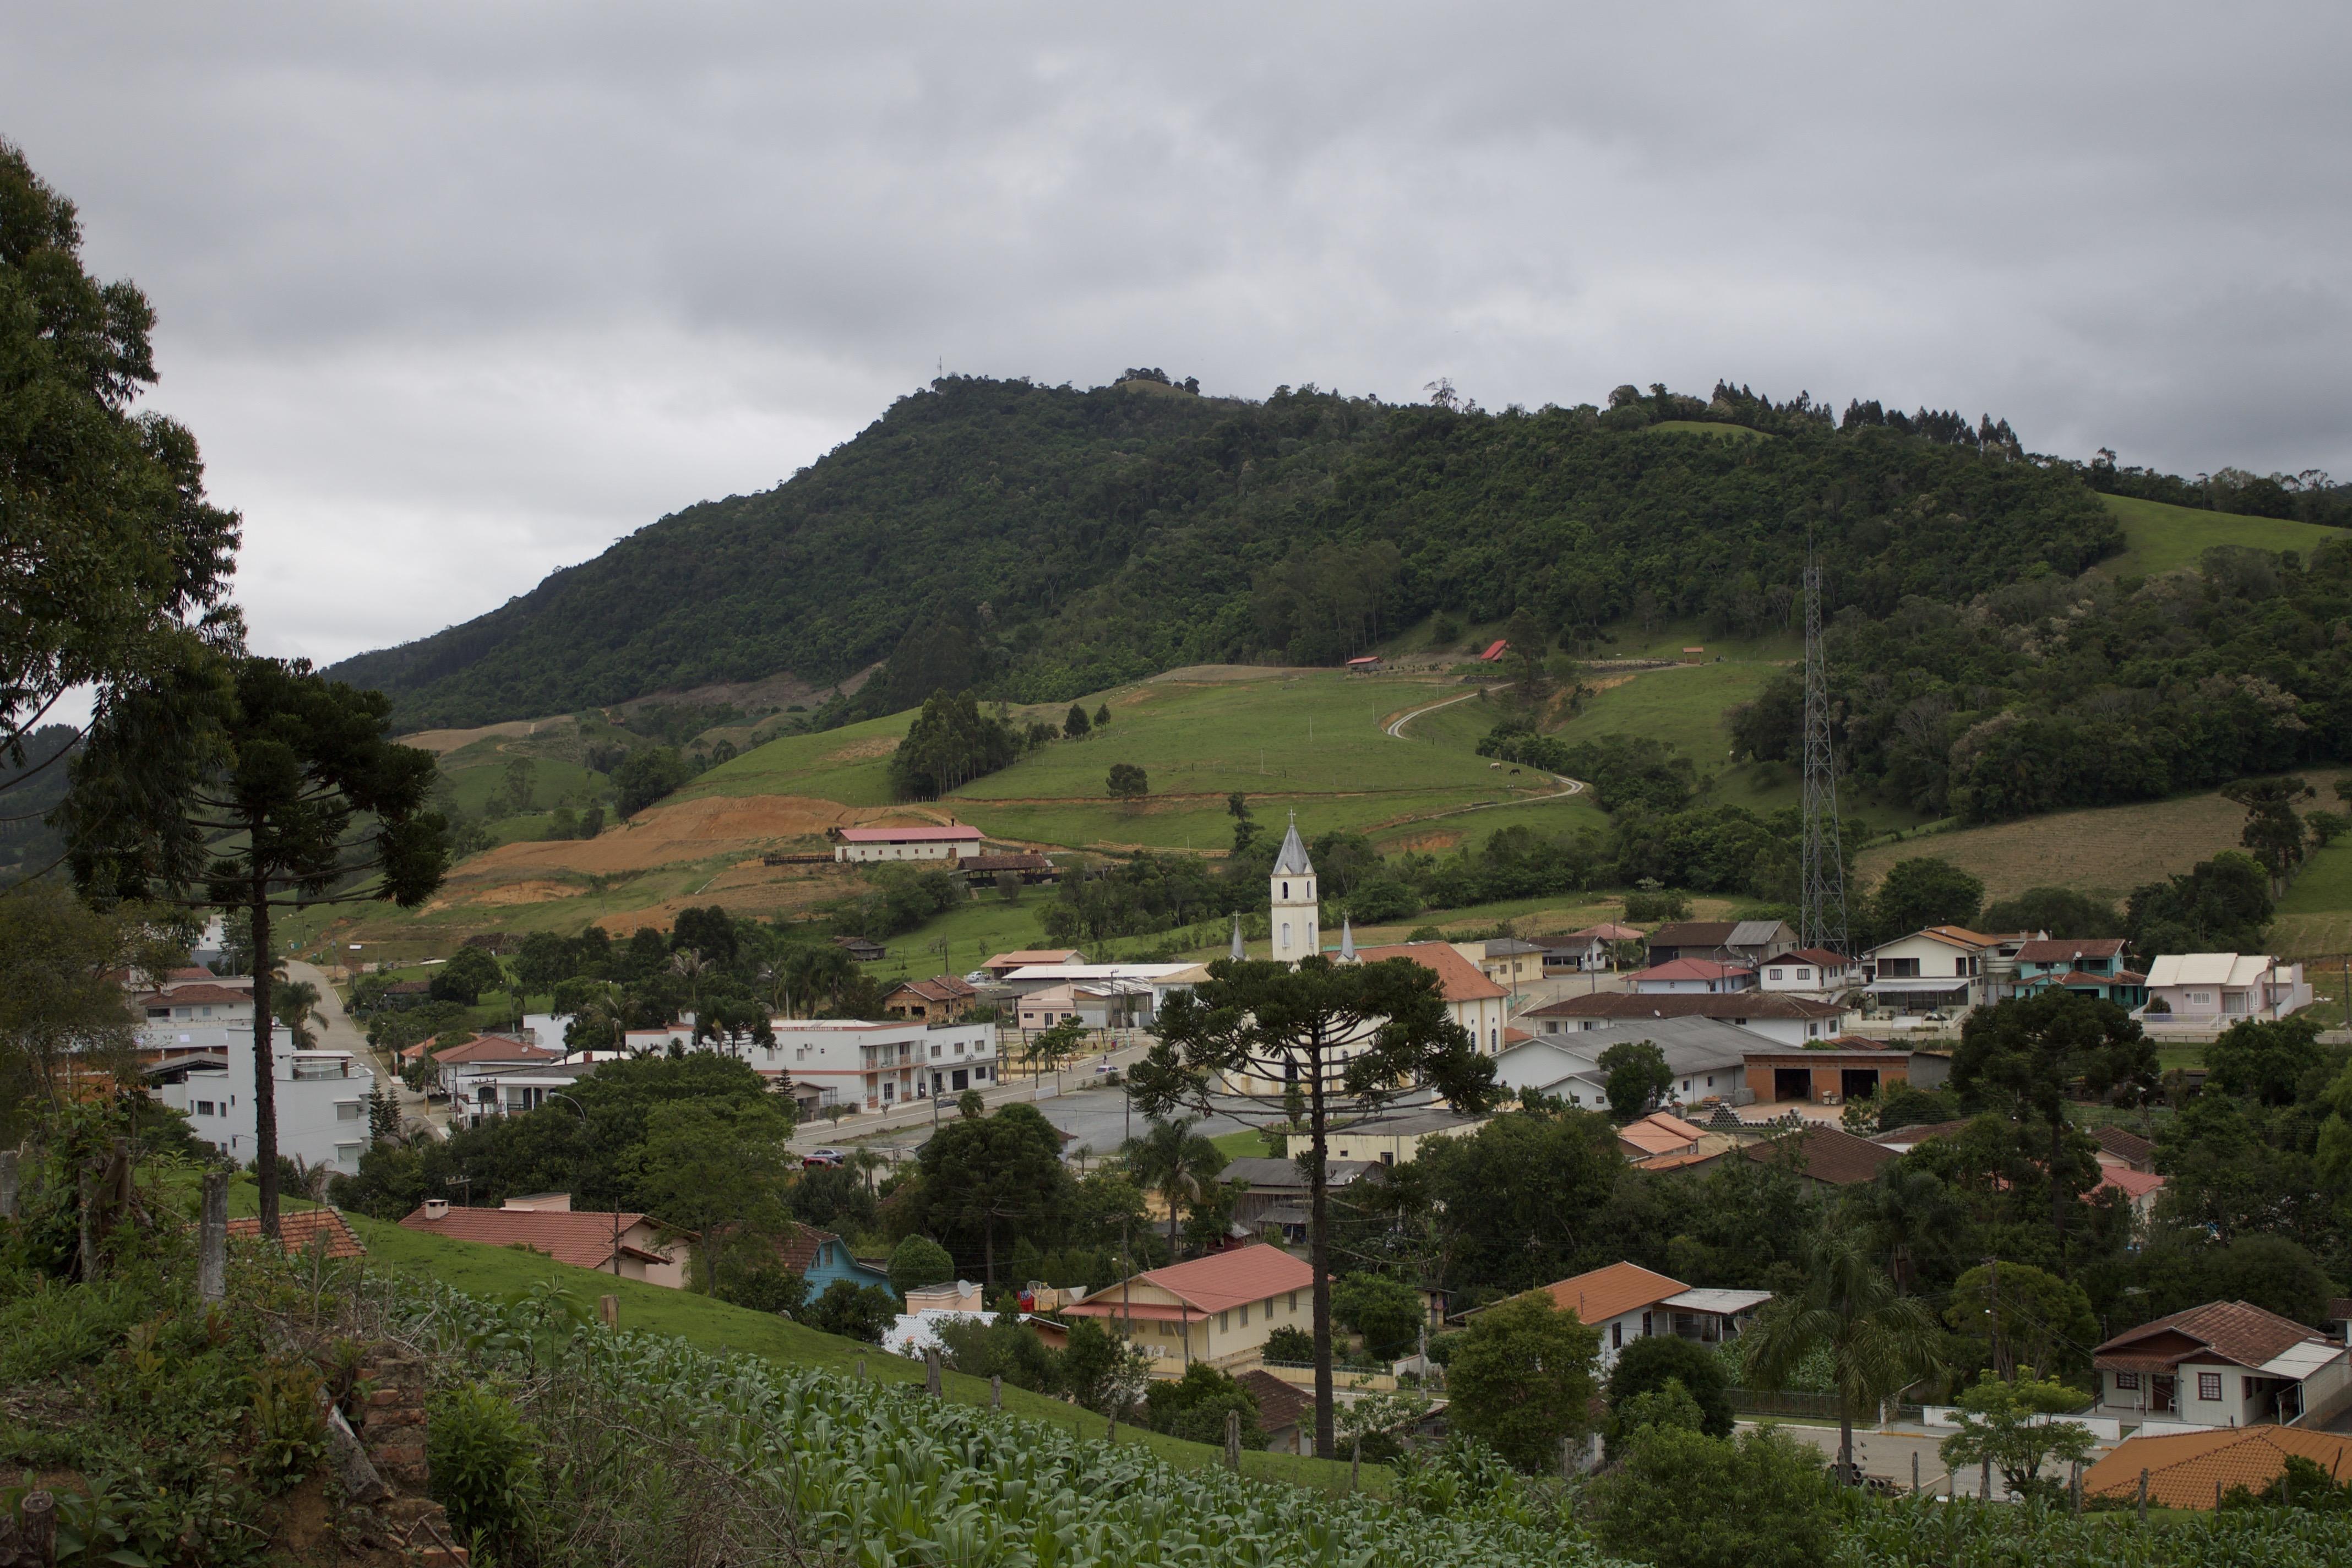 Leoberto Leal Santa Catarina fonte: upload.wikimedia.org